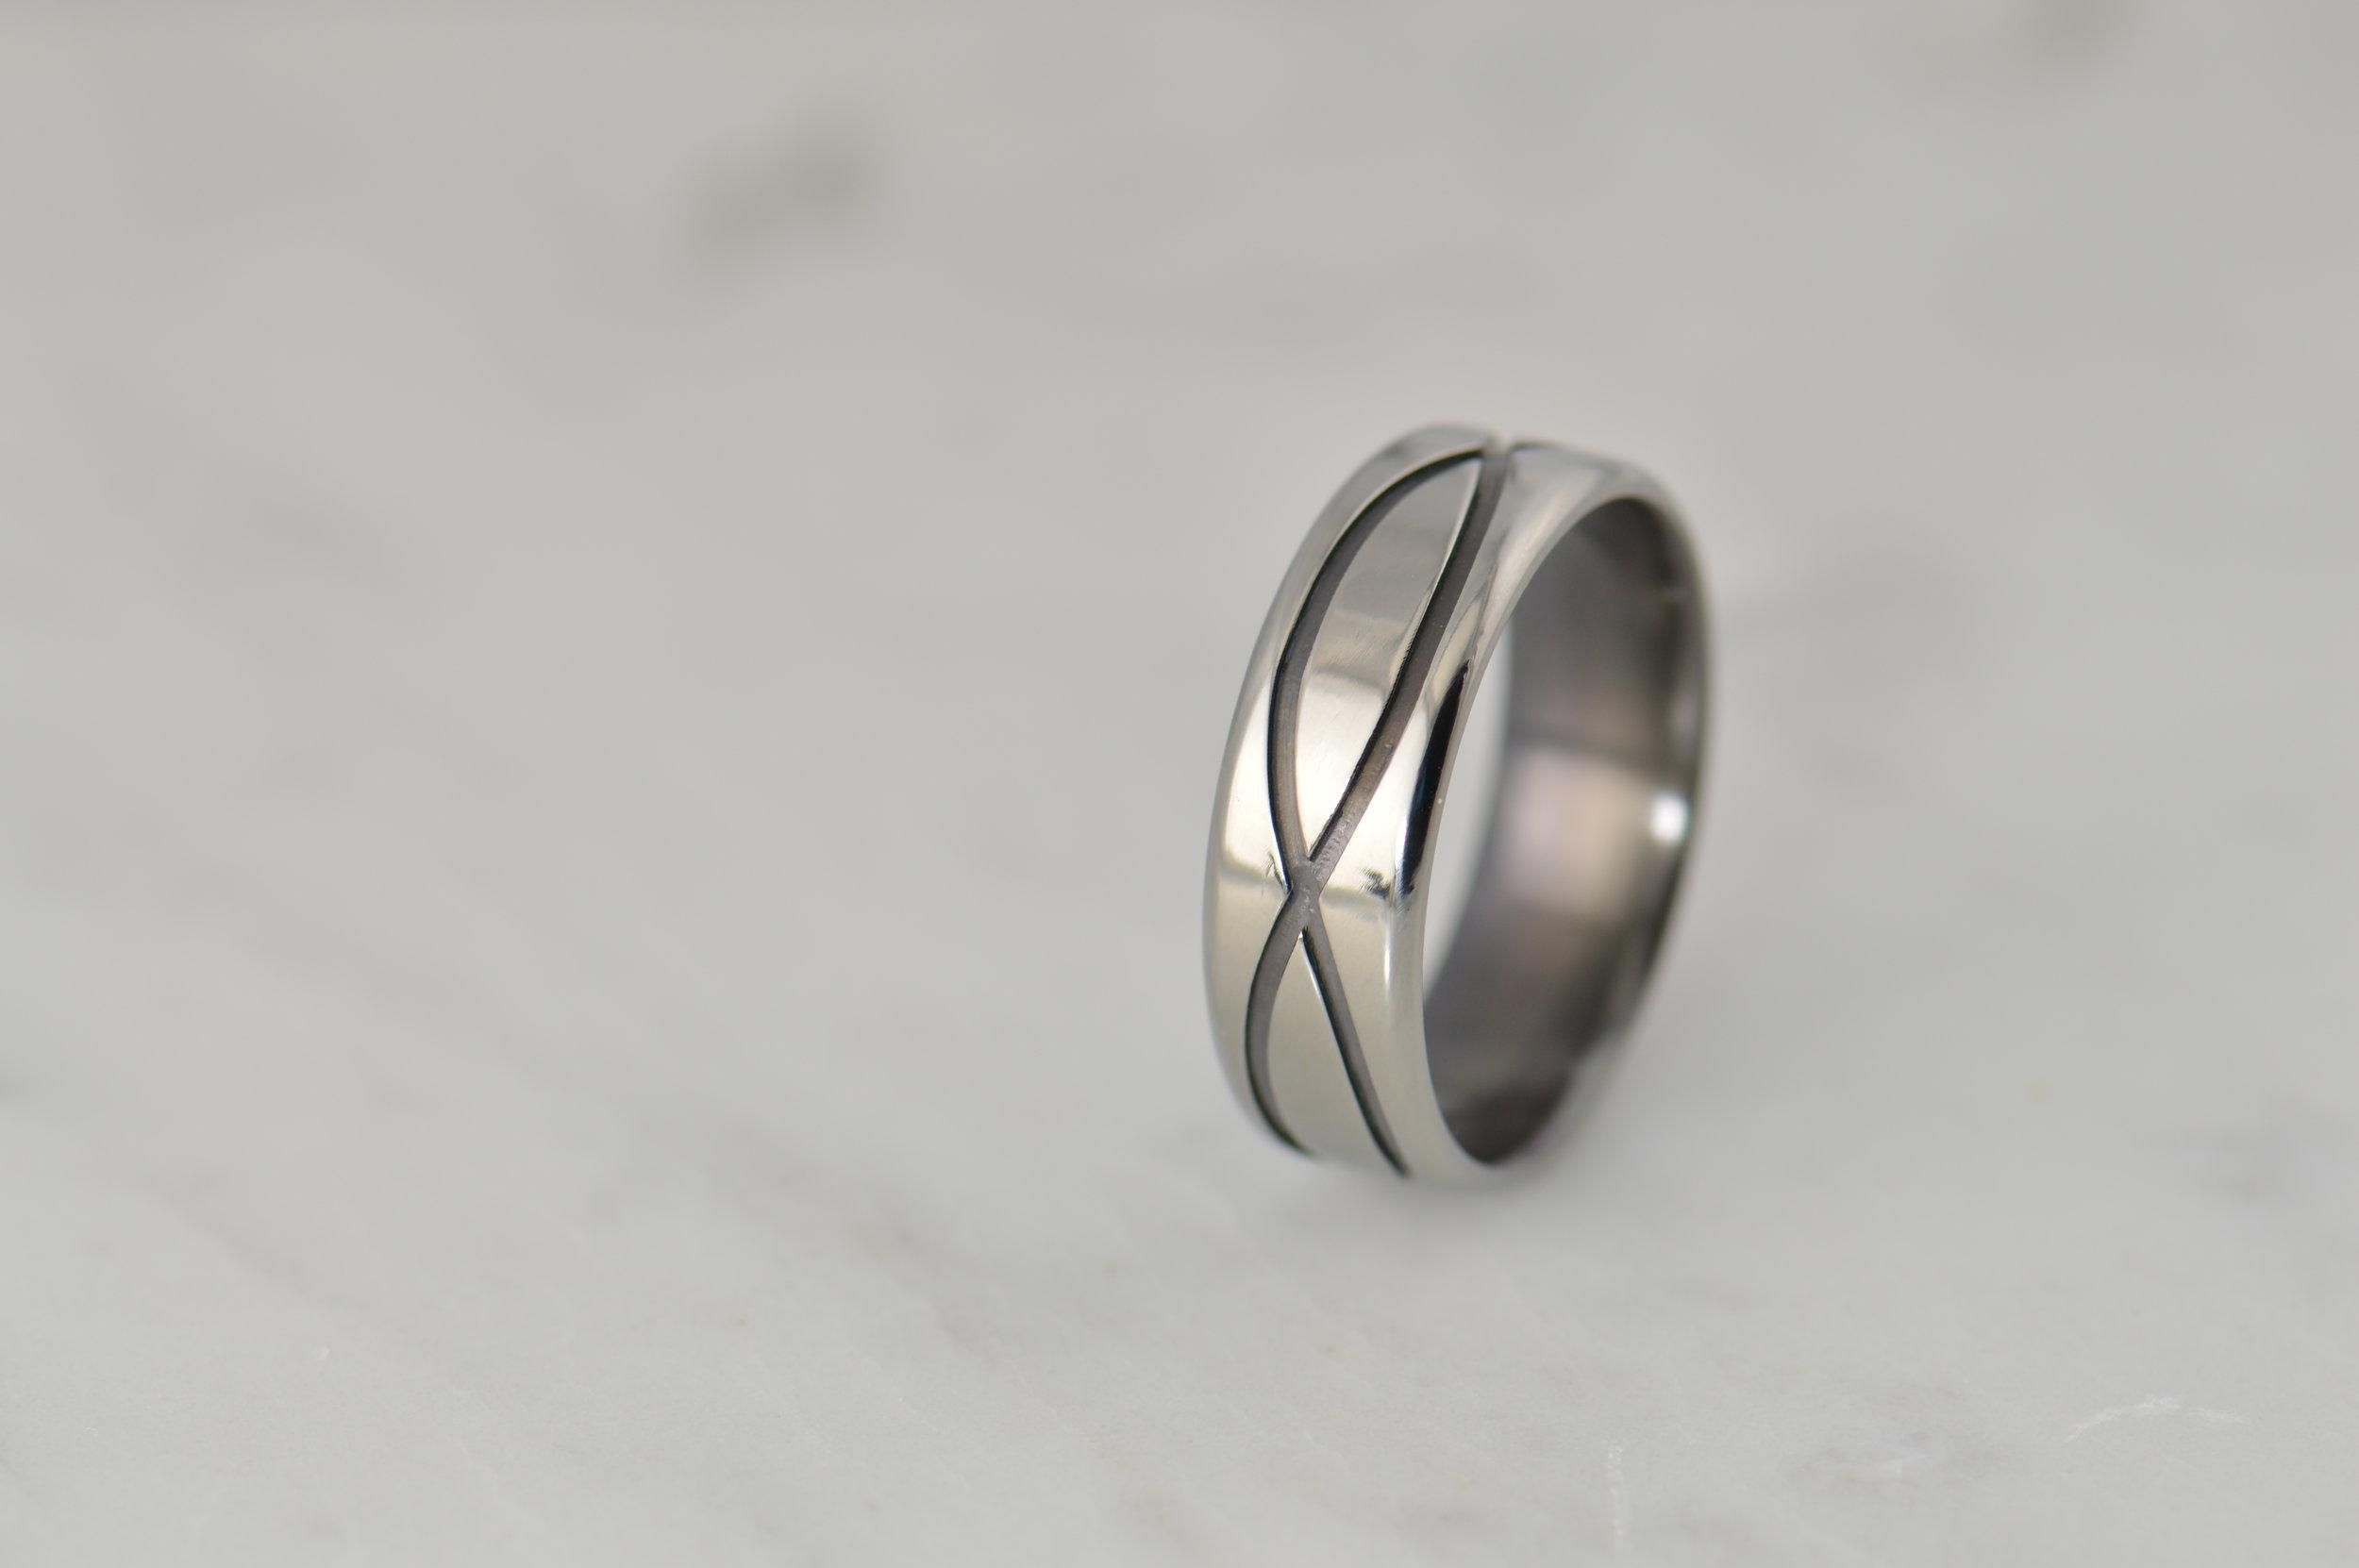 darvier-machined-black-channel-wedding-ring-bevel-edge.JPG